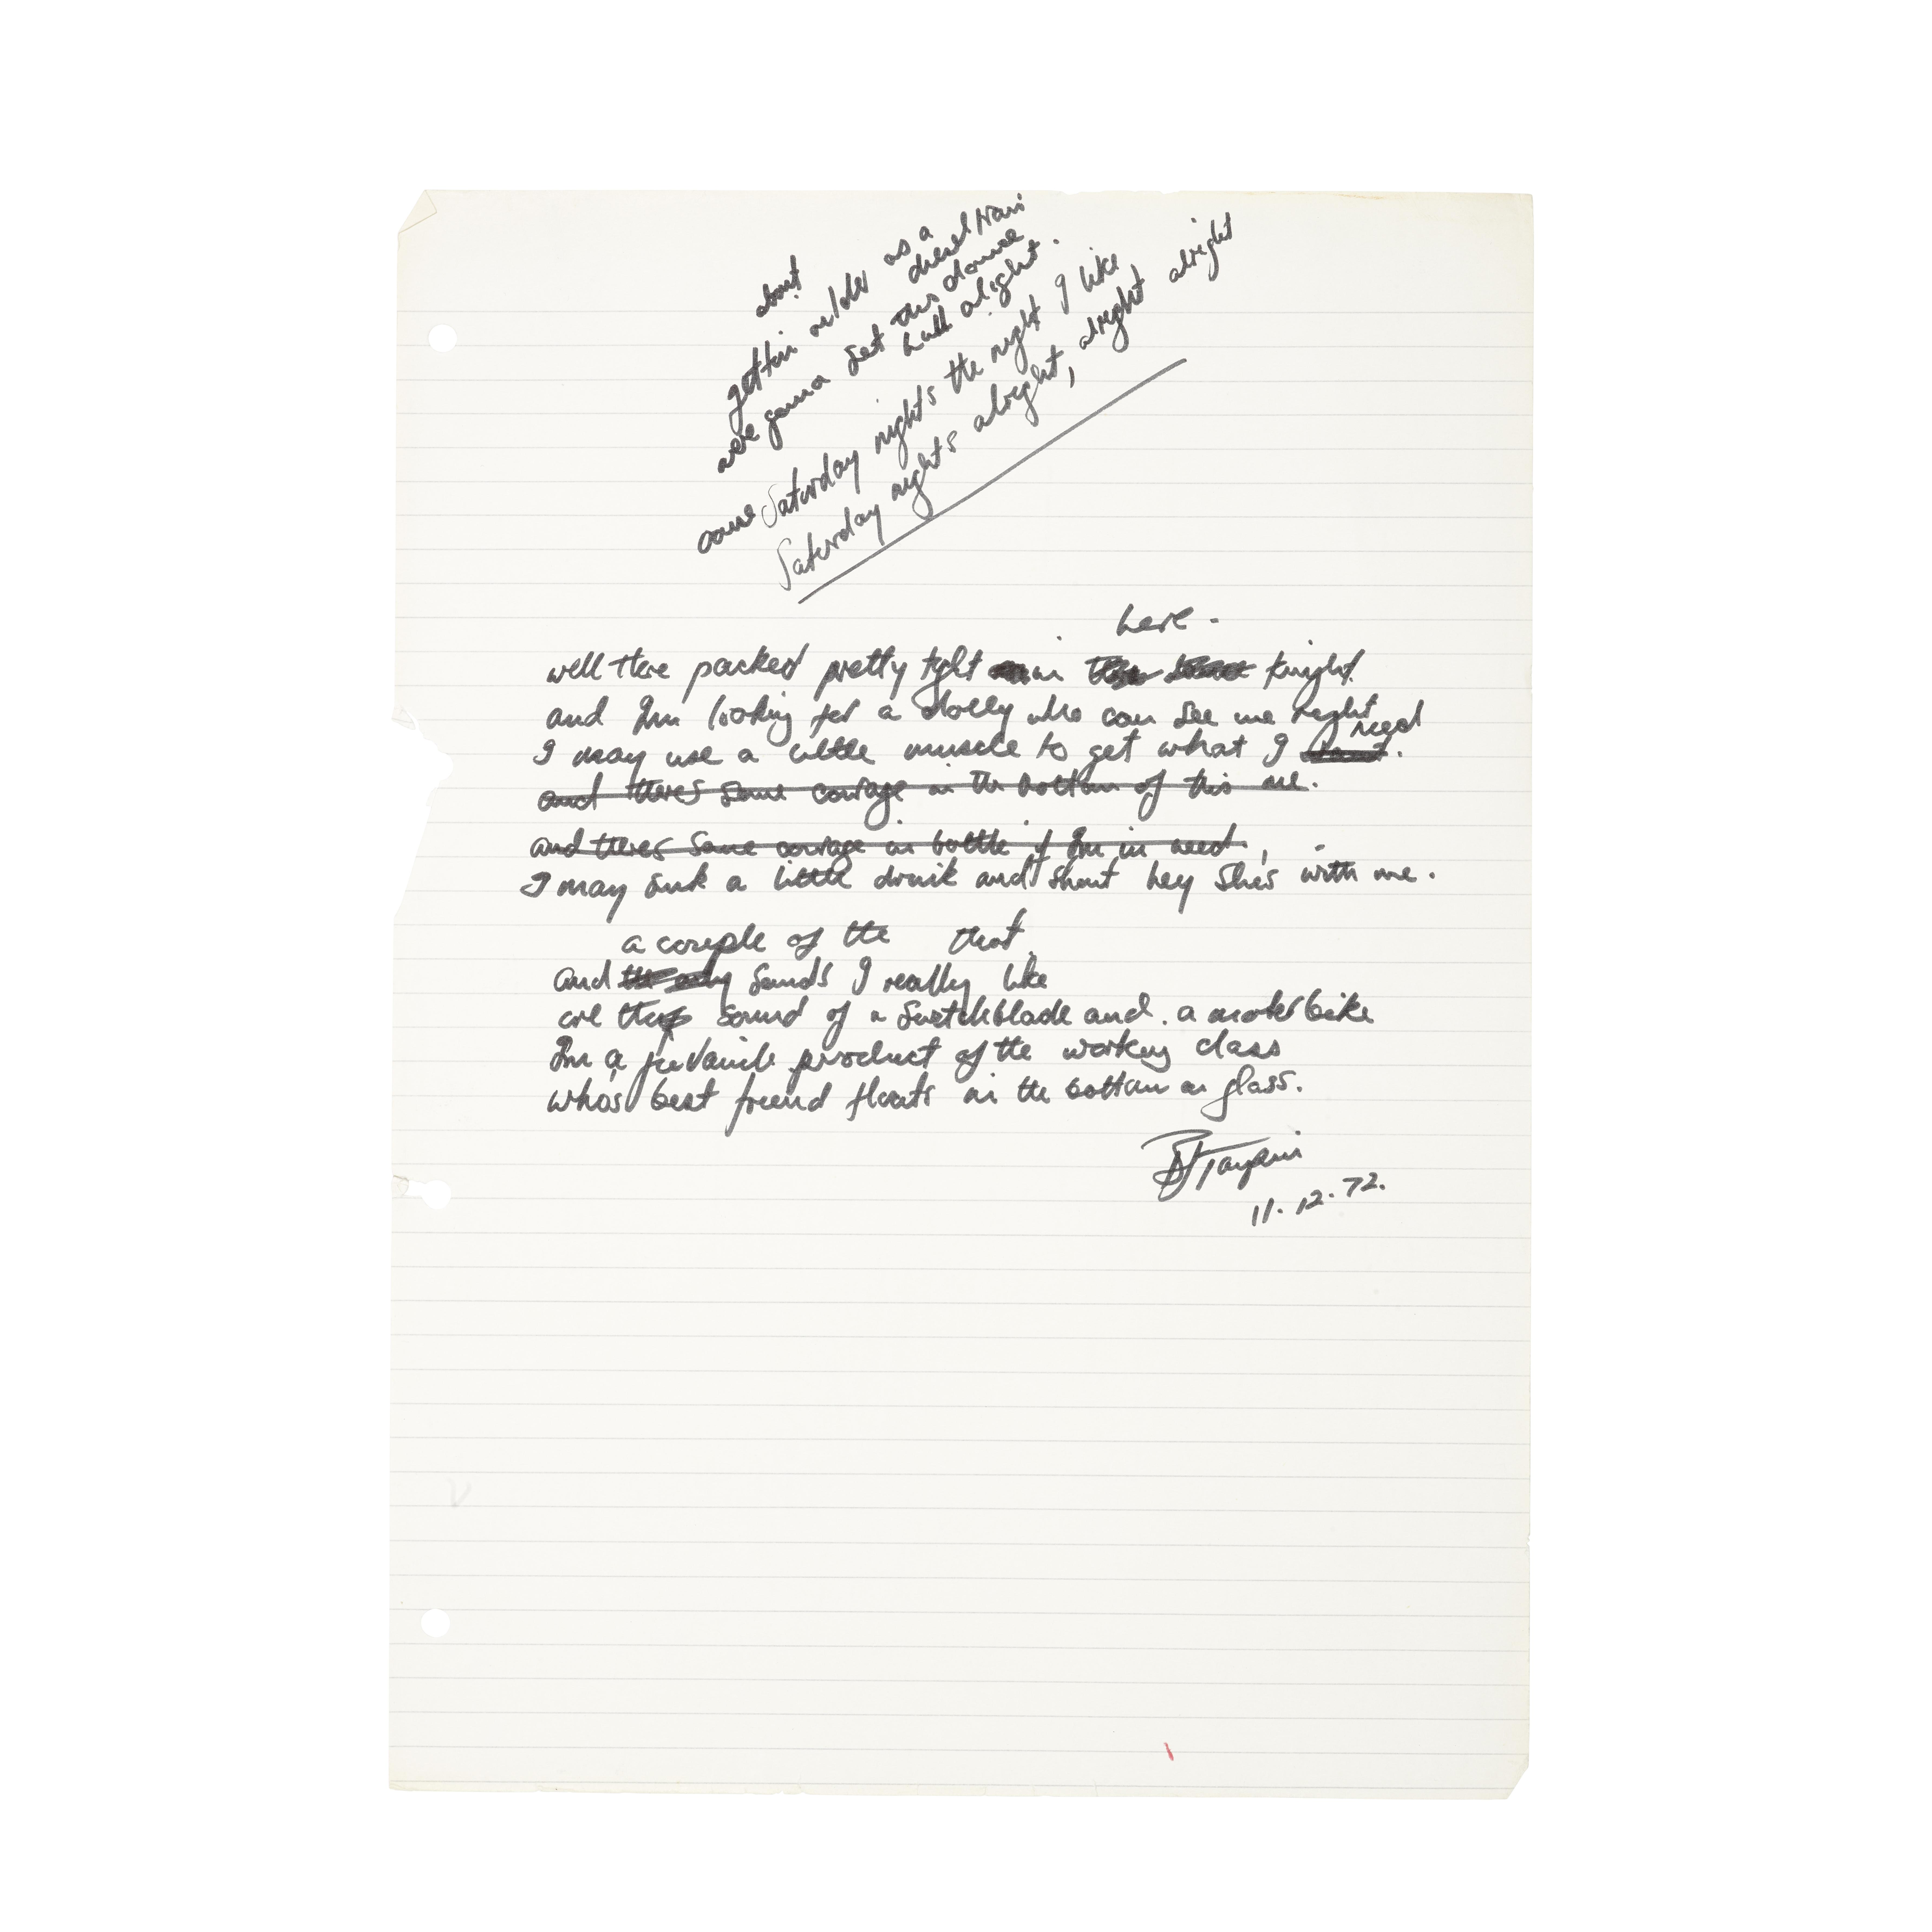 Lot 53 - Original handwritten lyrics for Elton John's 'Saturday Night's Alright for Fighting'